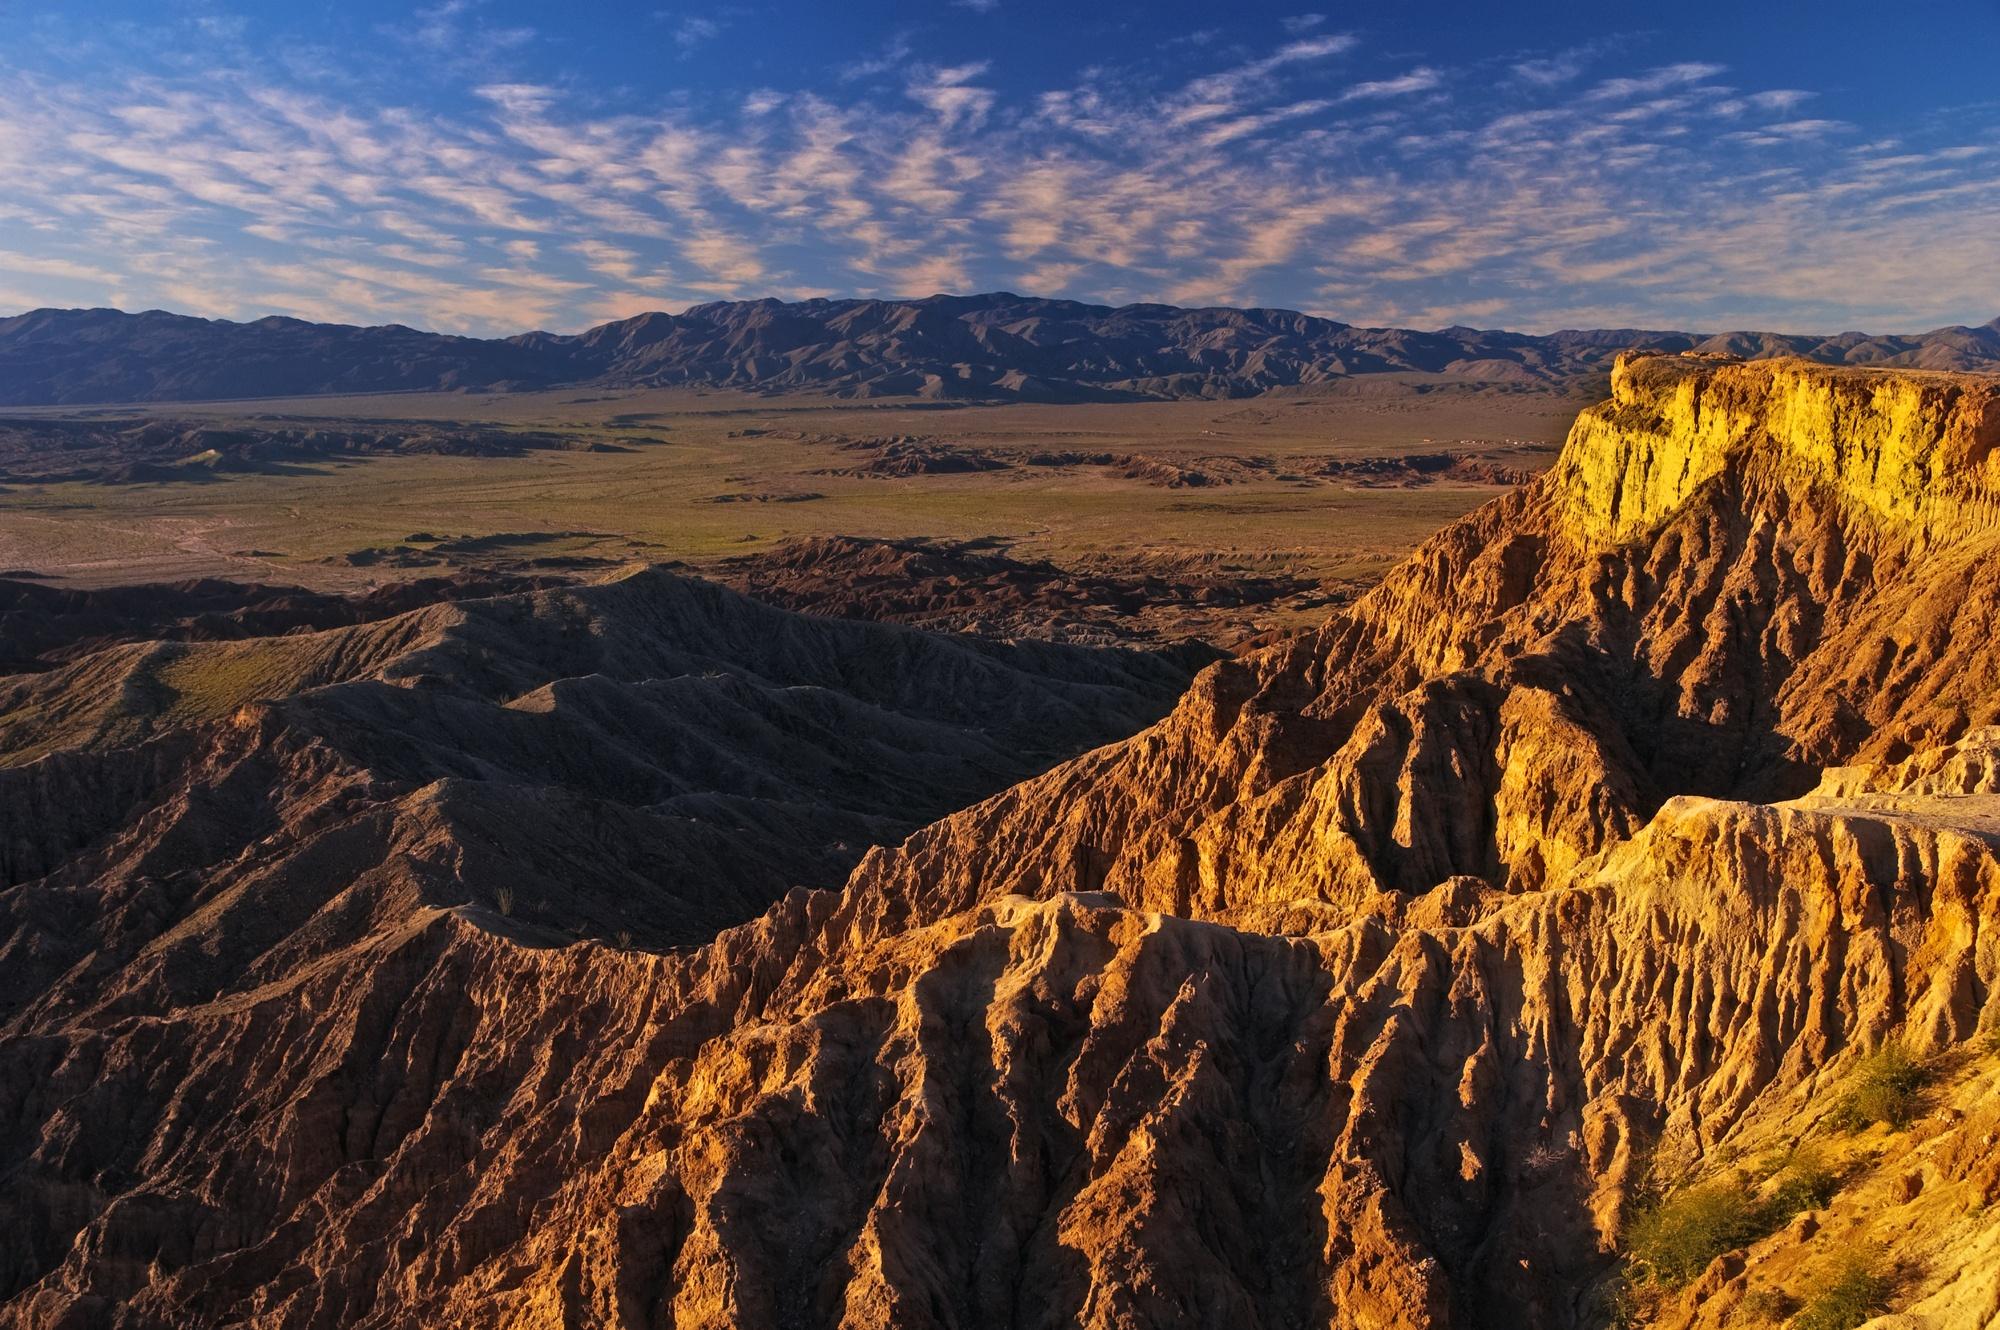 Stark landscape at Anza-Borrego State Desert Park